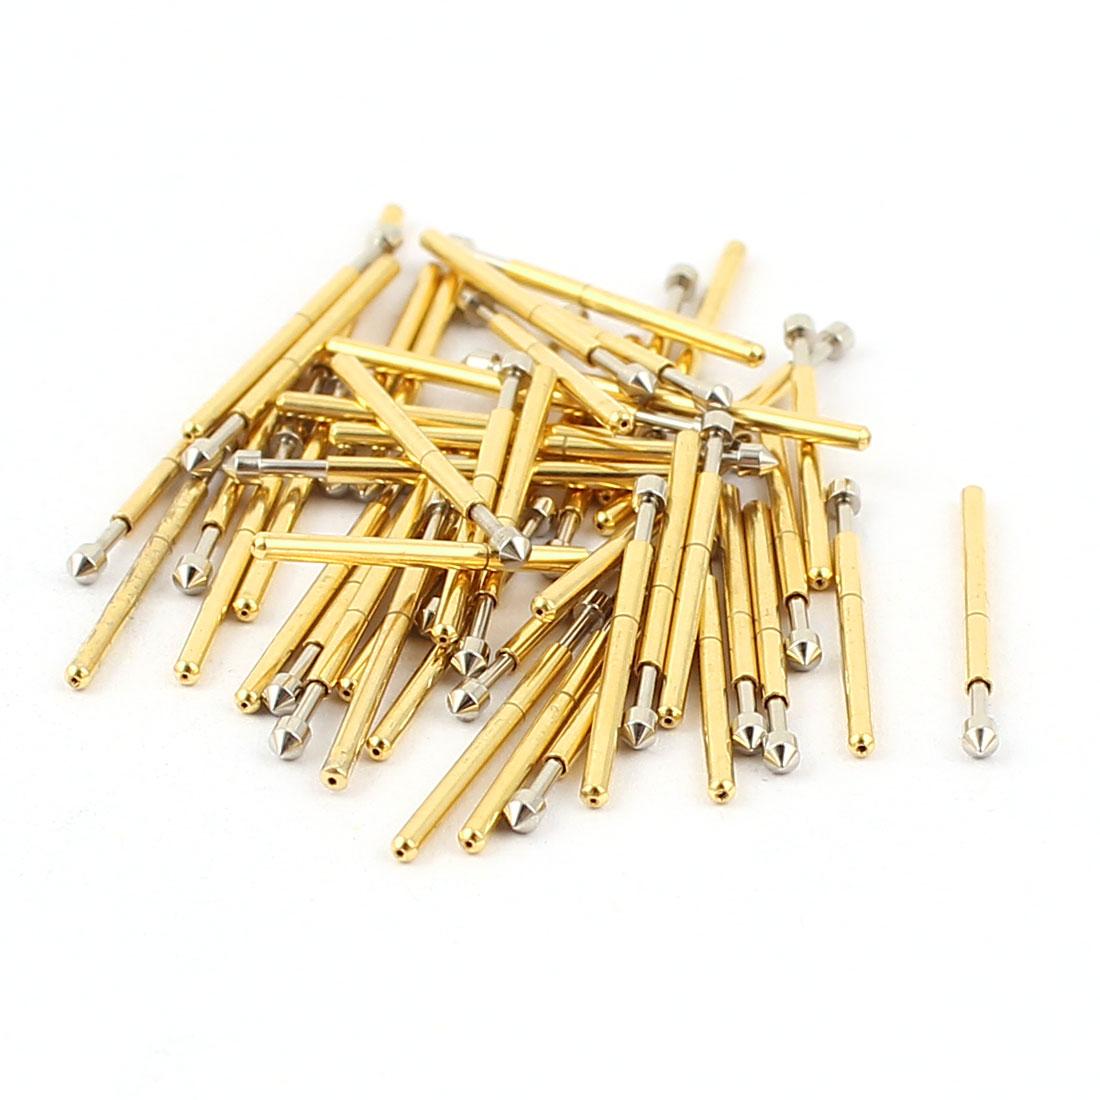 50 Pcs P75-E2 1.3mm Convex Tip Spring Testing Probes Pin 16.5mm Length